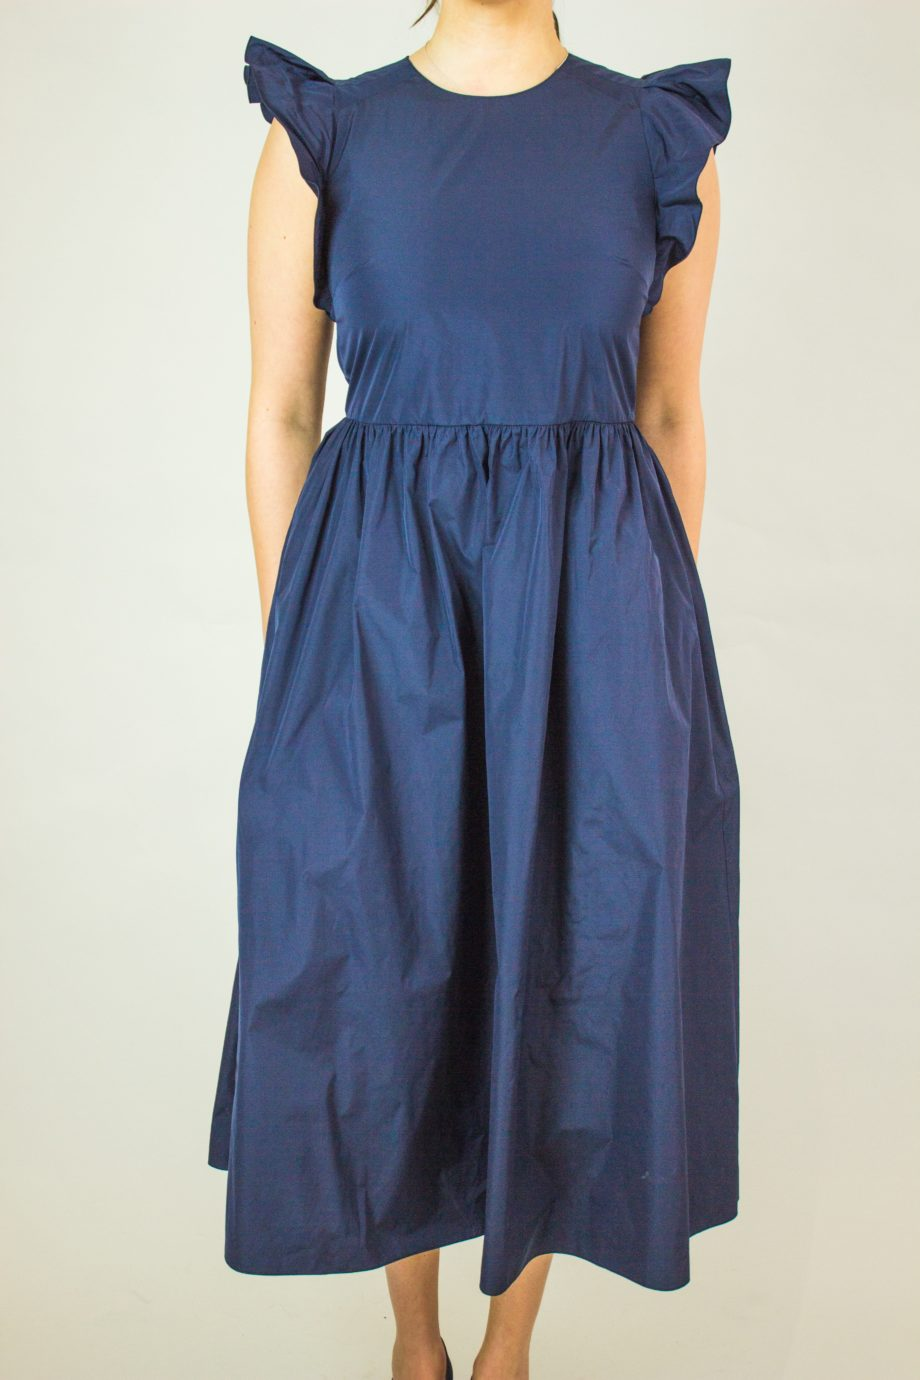 RED VALENTINO Dark blue dress